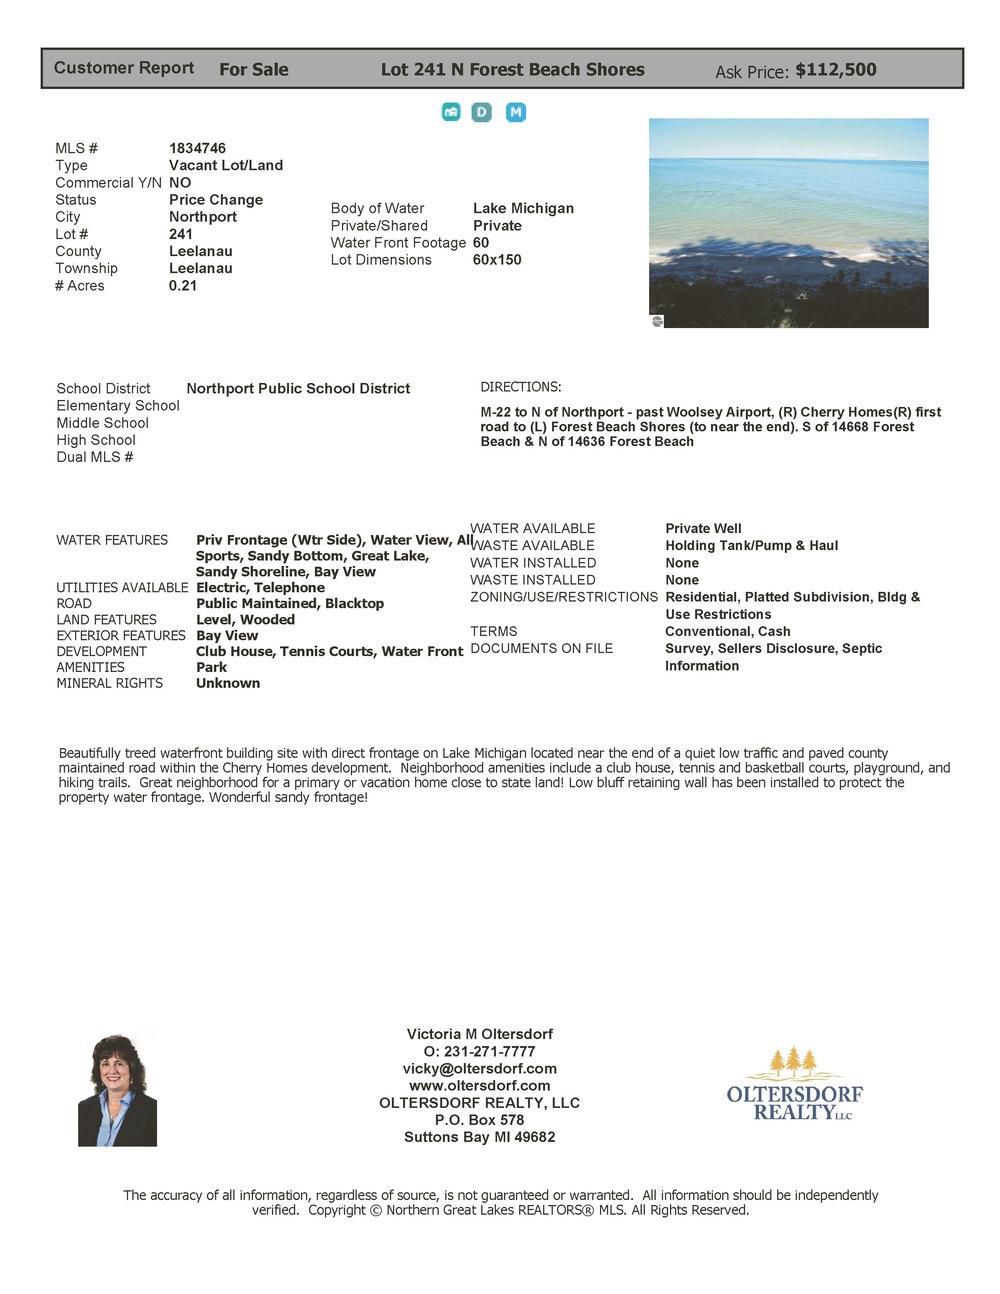 Lot 241 N Forest Beach, Northport 112,500 MLS.jpg